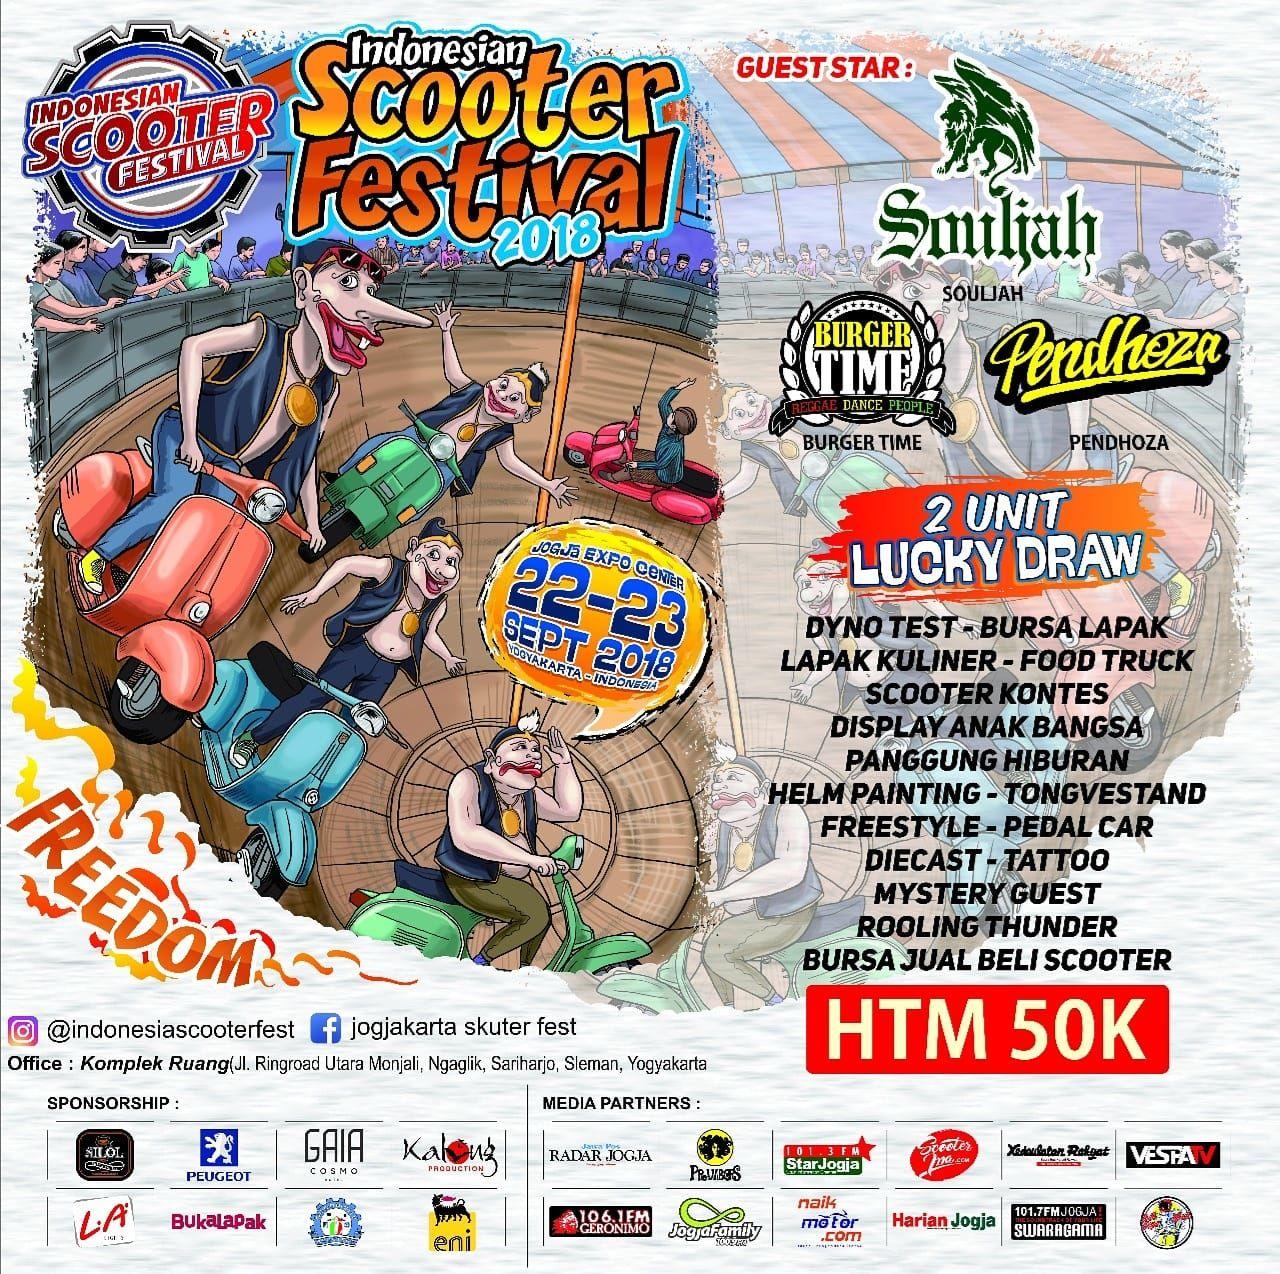 Indonesia Scooter Festival 2018 Lebaran Anak Vespa